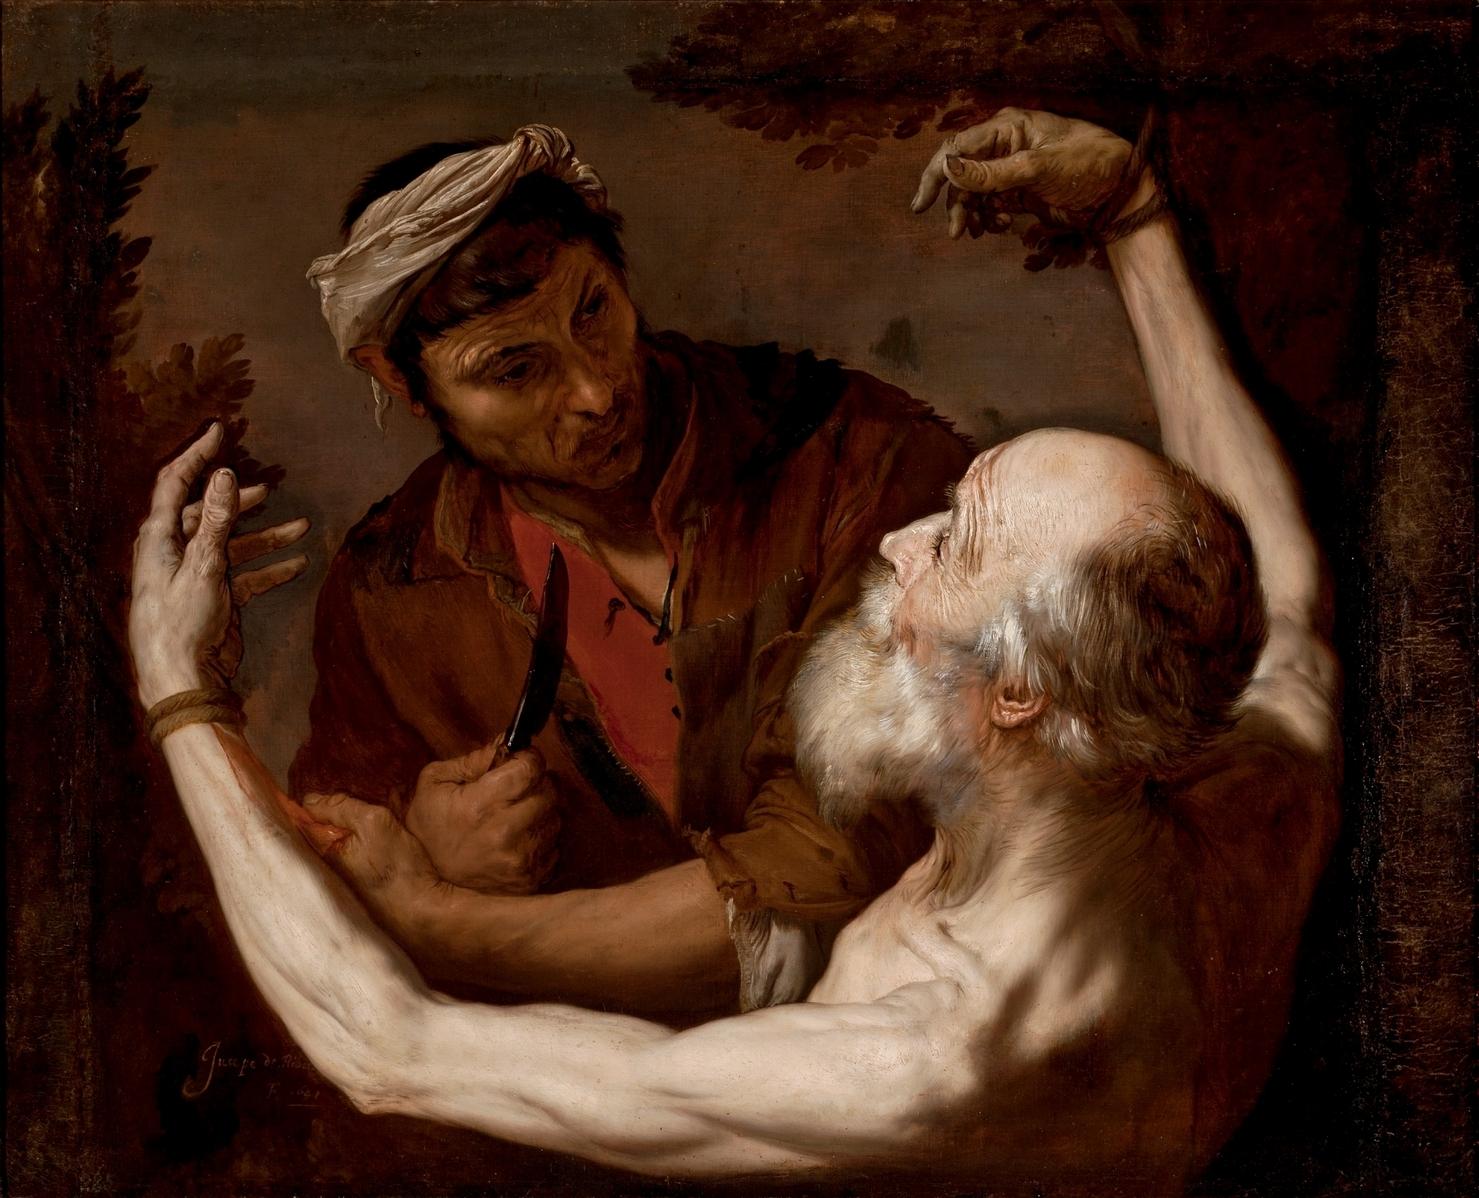 José de Ribera. The Martyrdom of Saint Bartholomew. 17th century